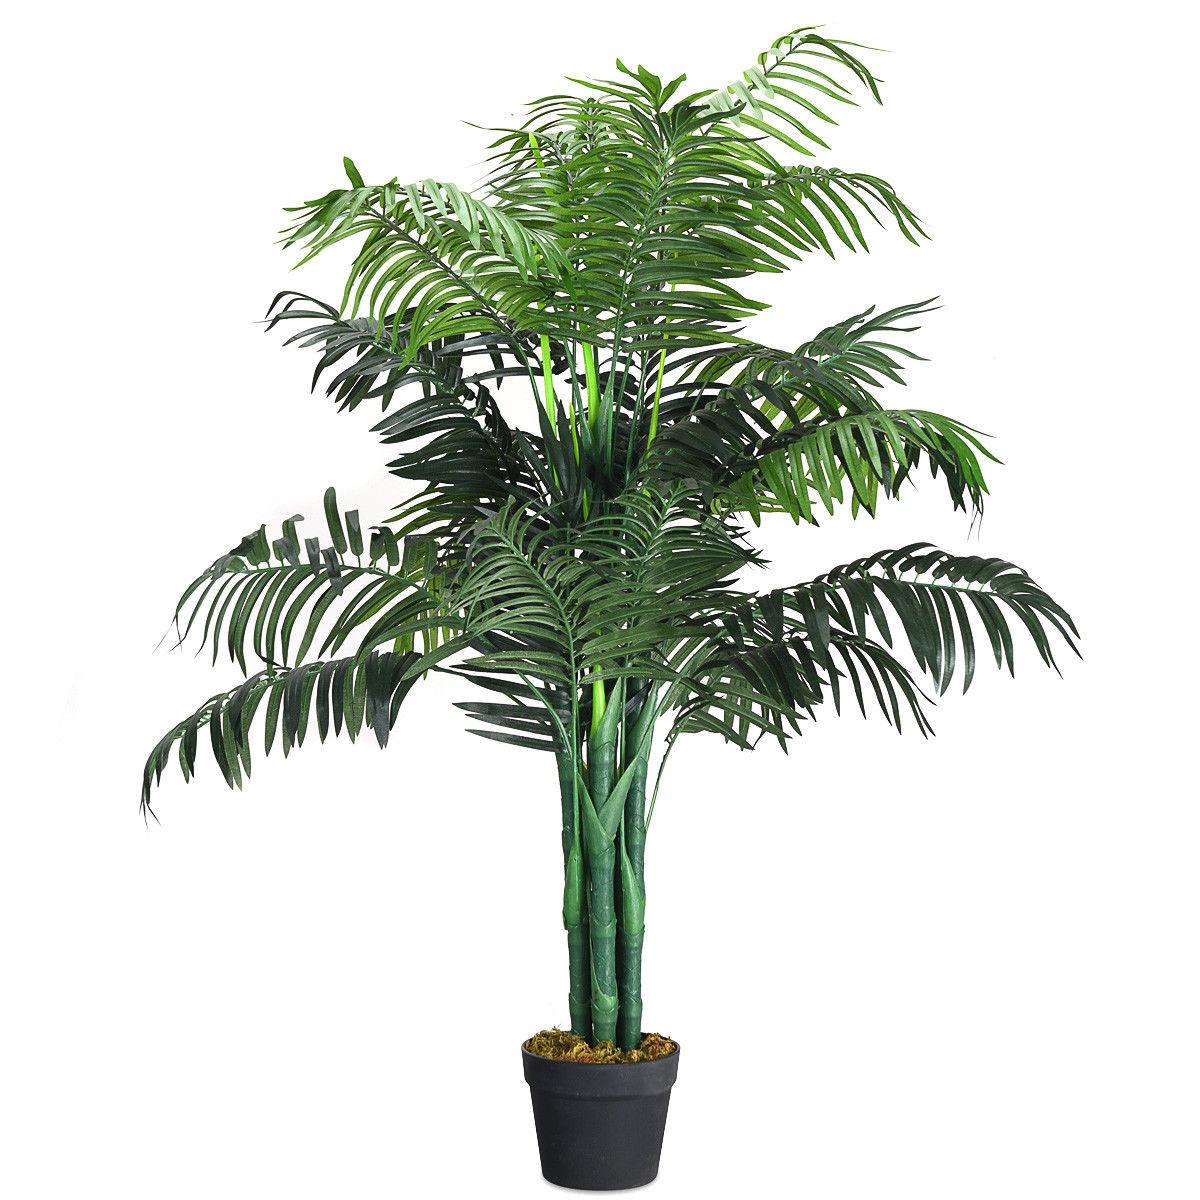 Gymax Artificial Areca Palm Decorative Silk Tree w/Basket 3.5 Feet Holiday Decor